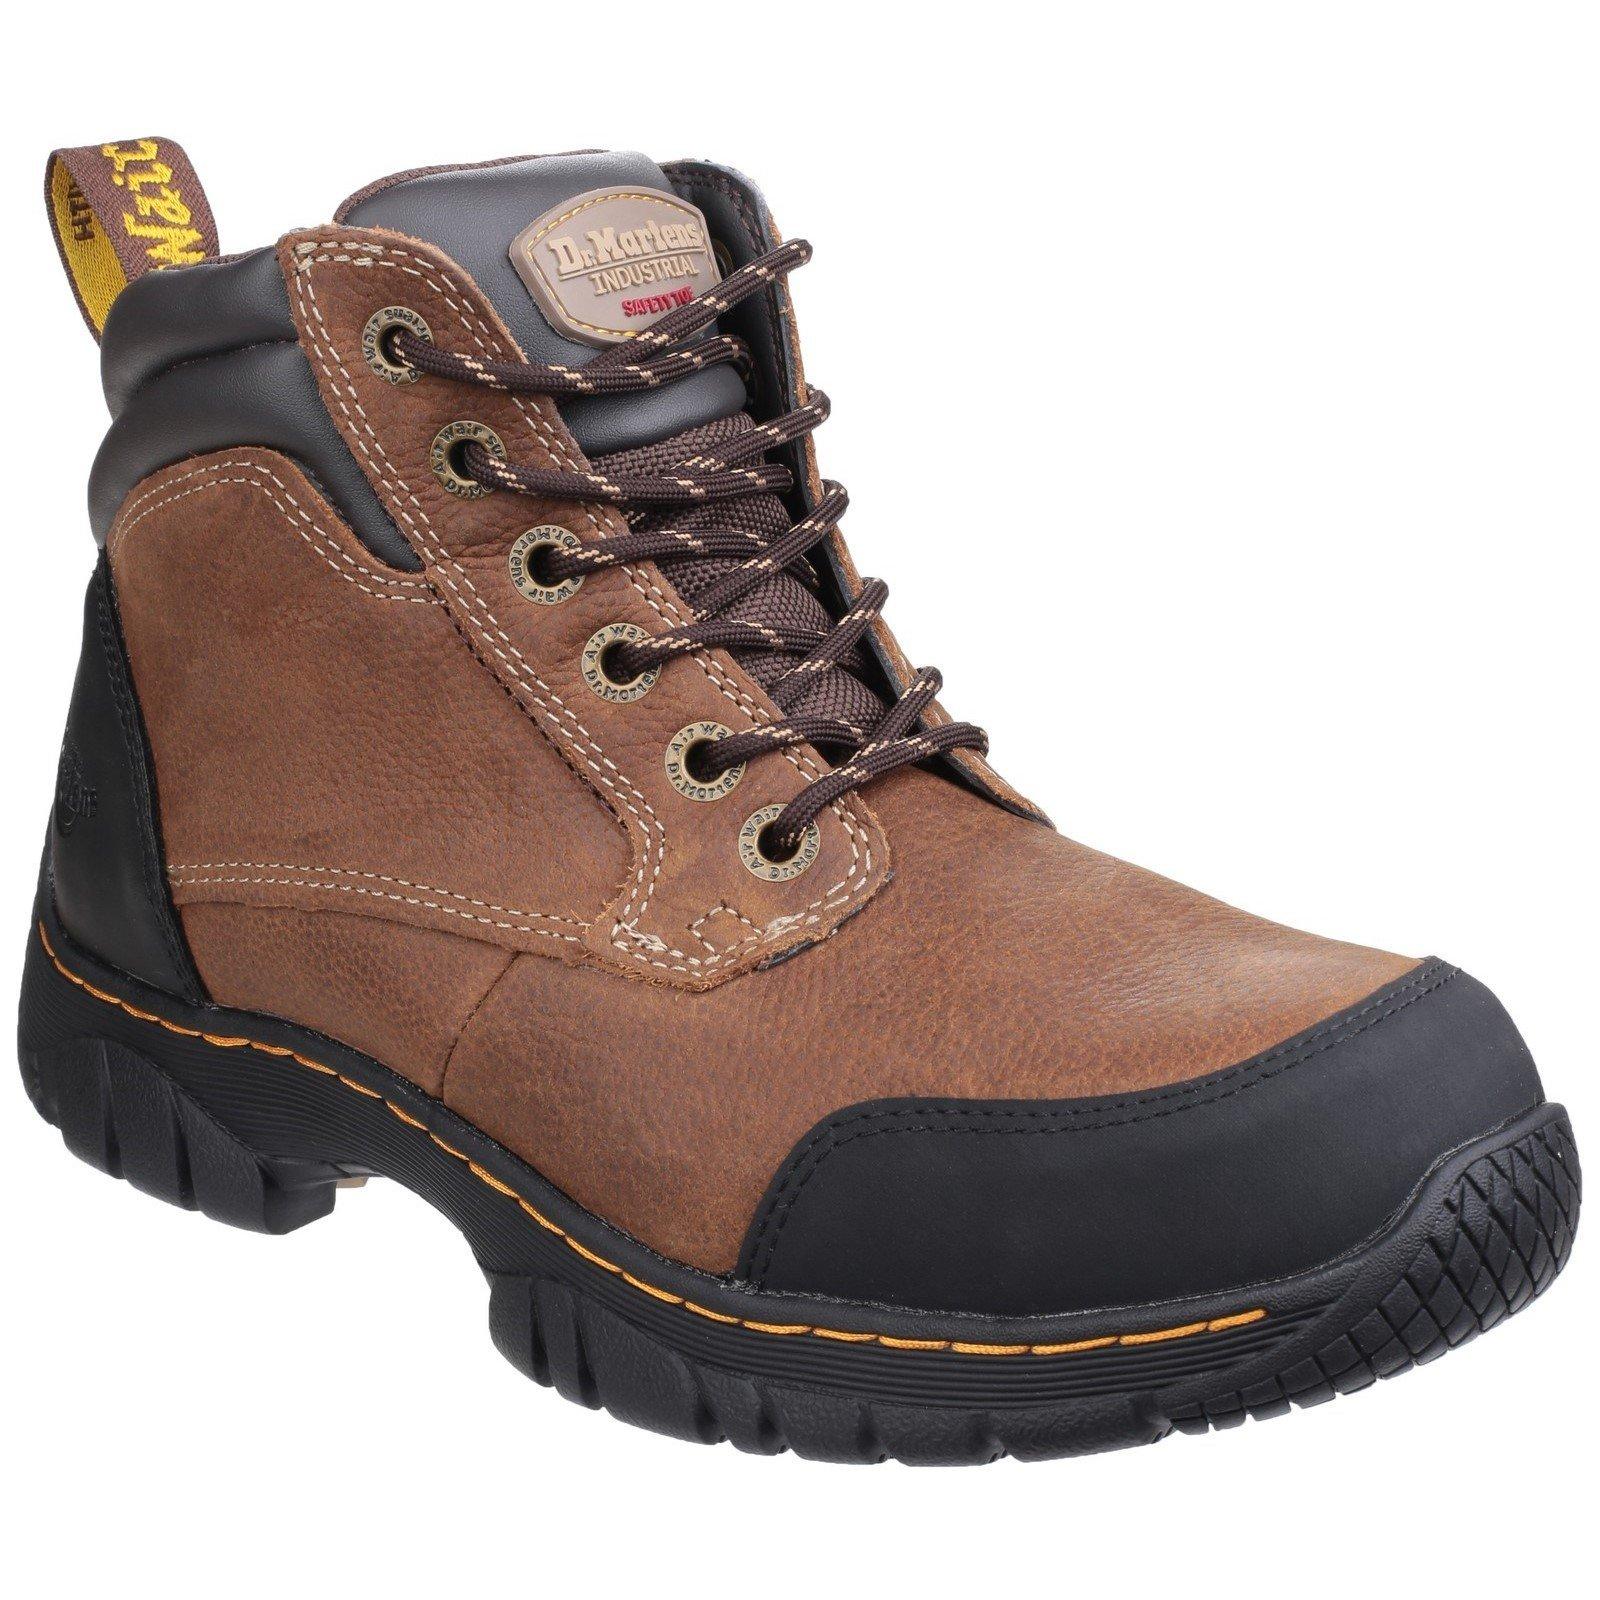 Dr Martens Unisex Riverton SB Lace up Hiker Safety Boot 24534 - Brown 13